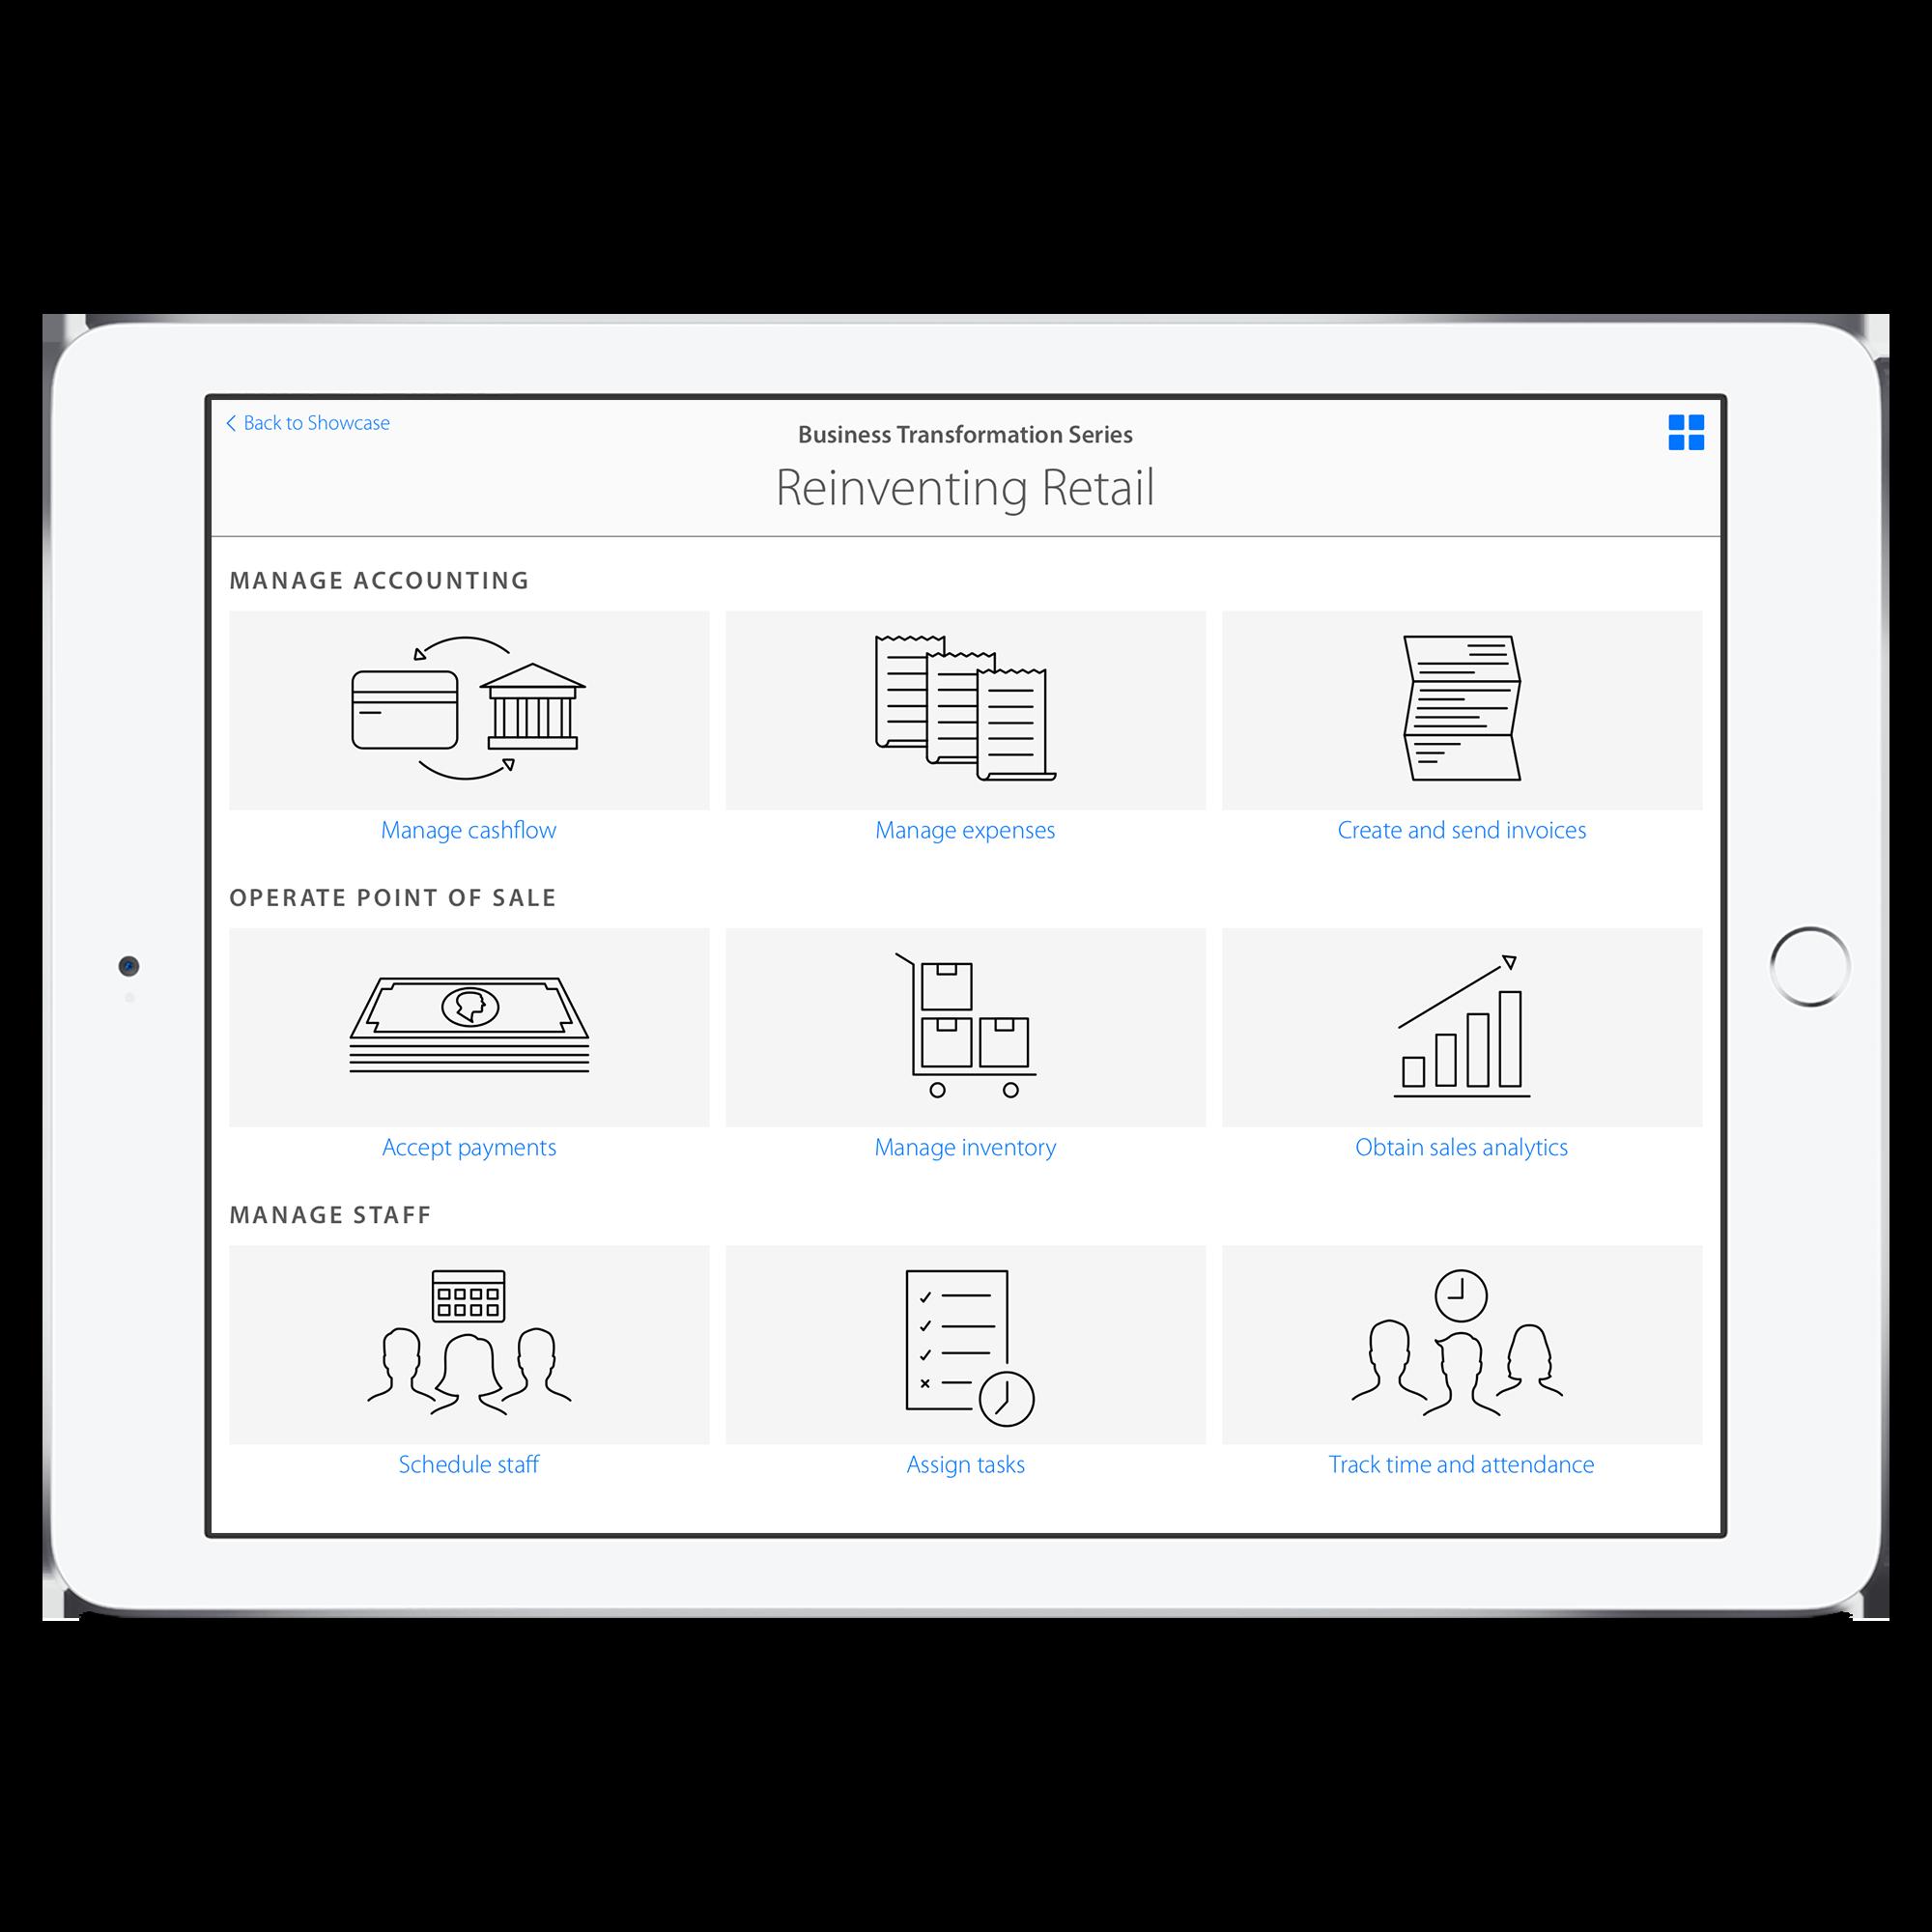 Showcase,Business Transformation Series- Reinventing Retail Episode (grid view)